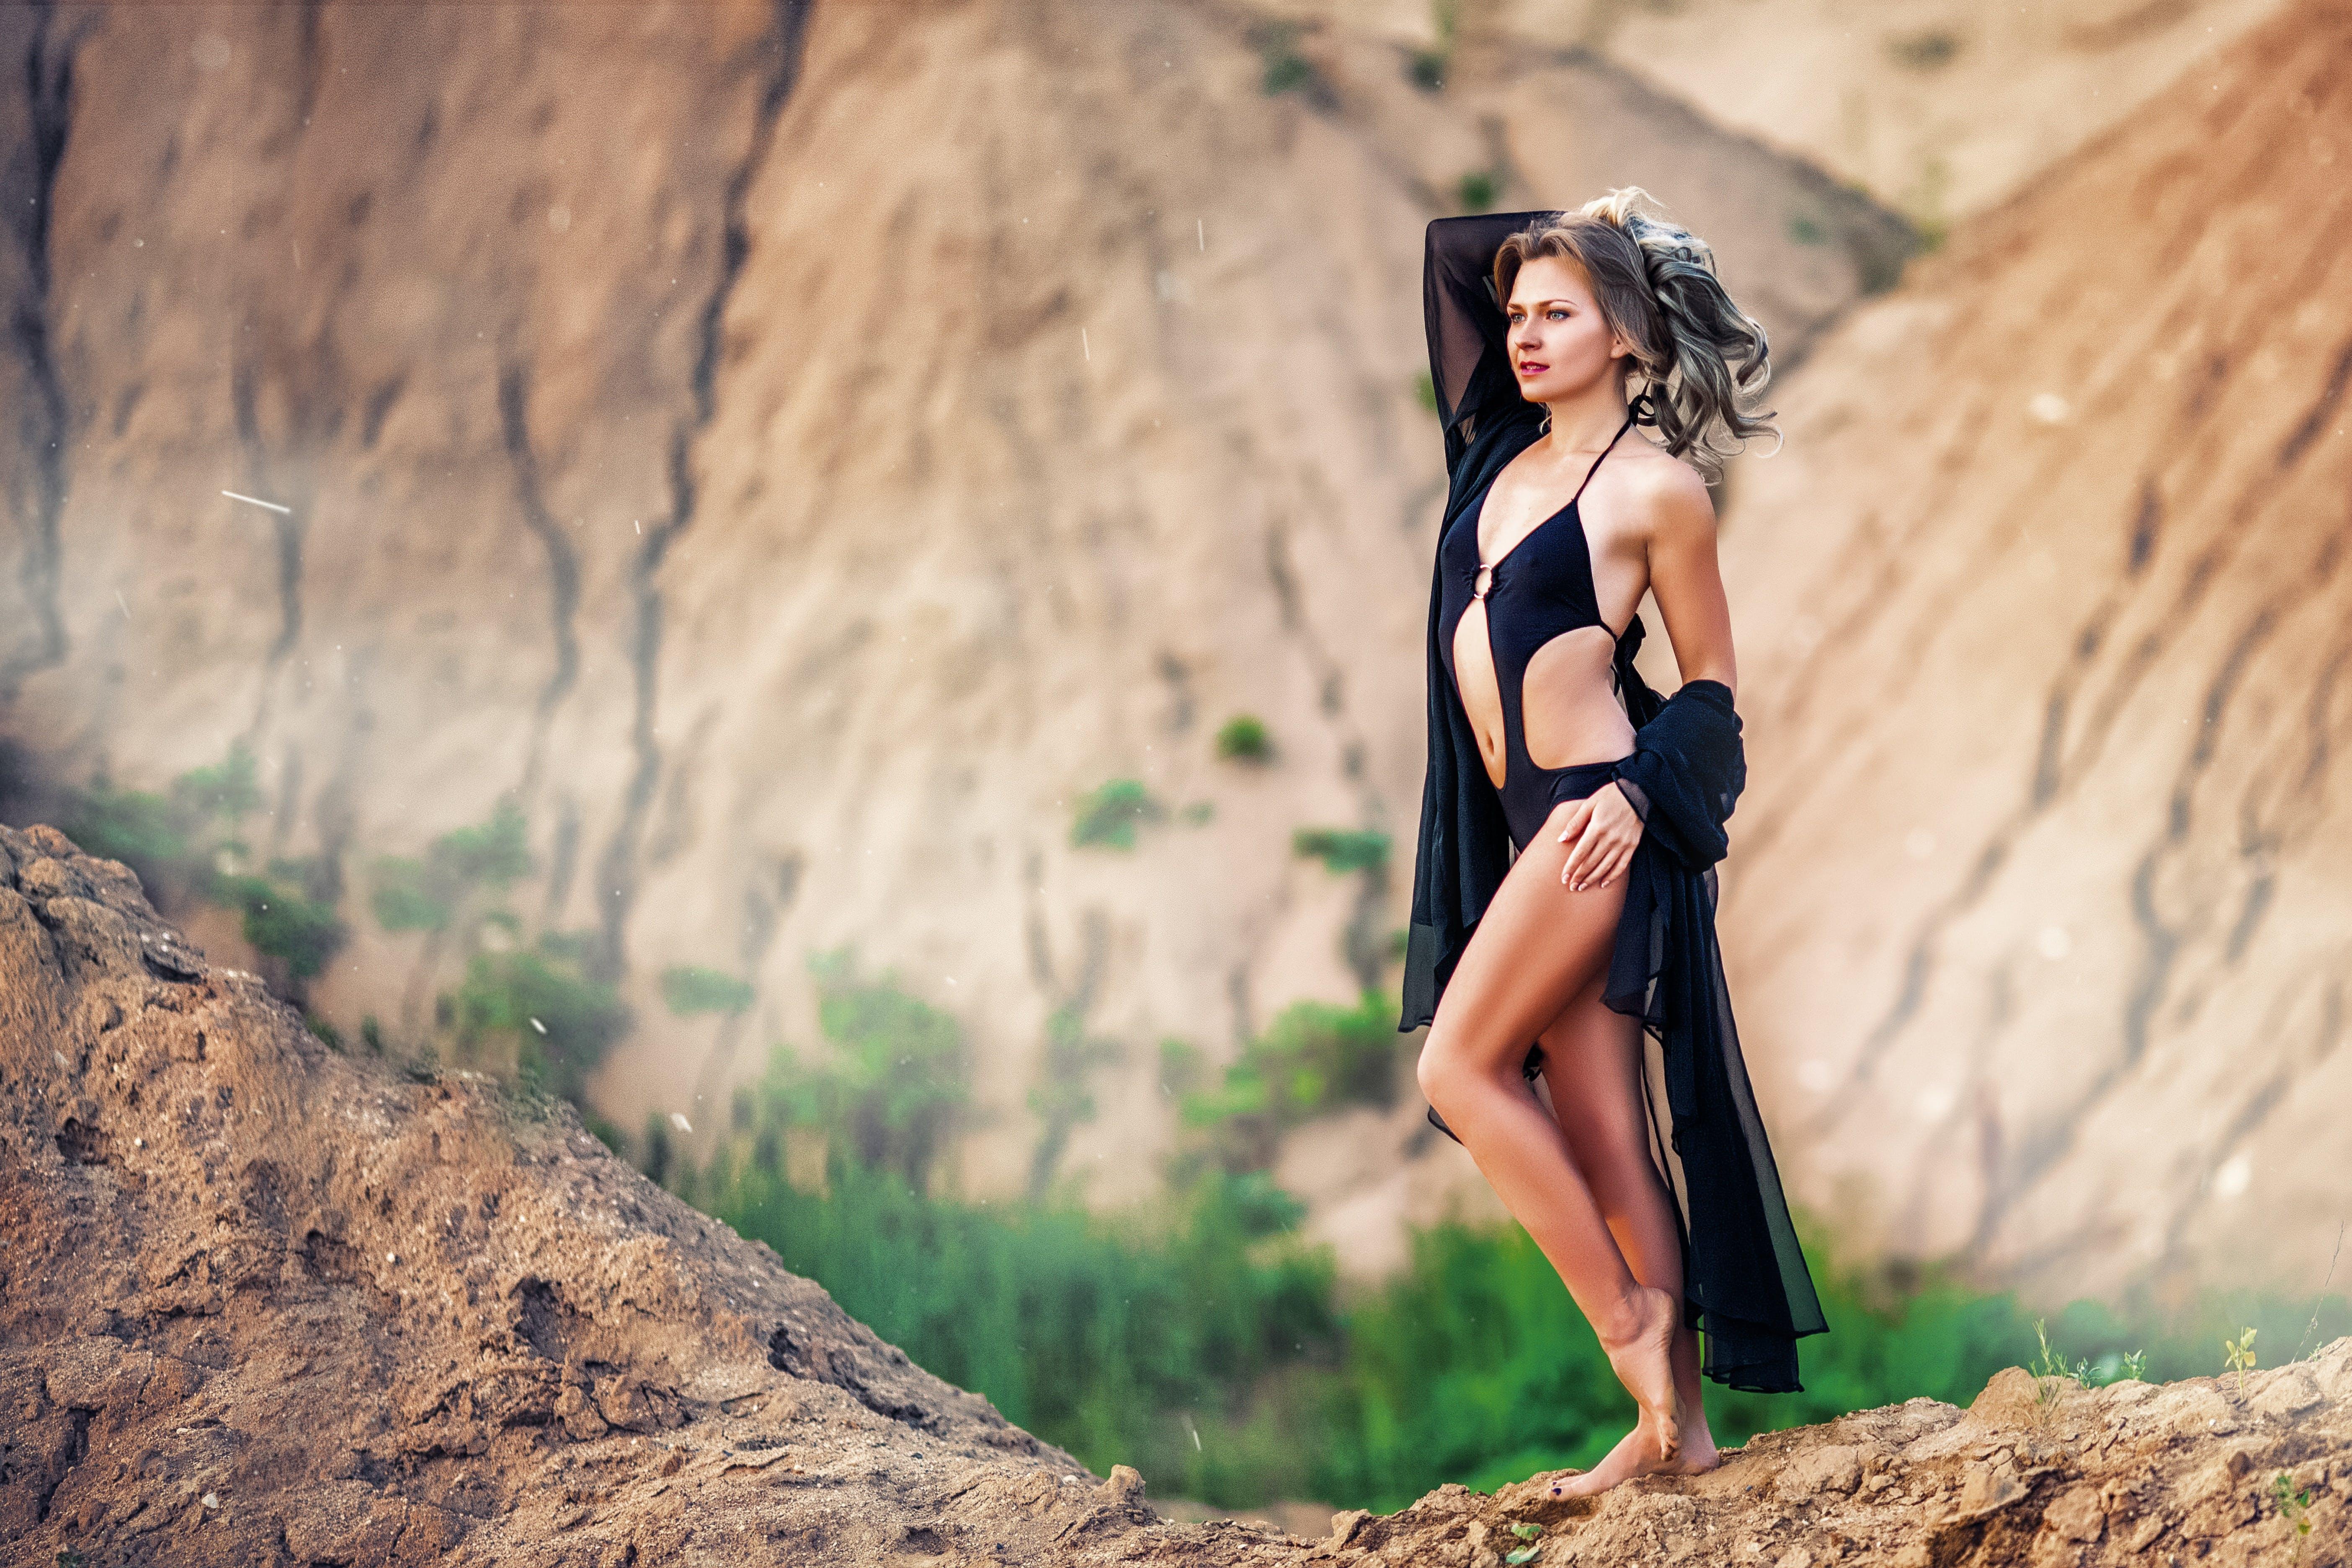 Kostenloses Stock Foto zu berg, bikini, draußen, erwachsener